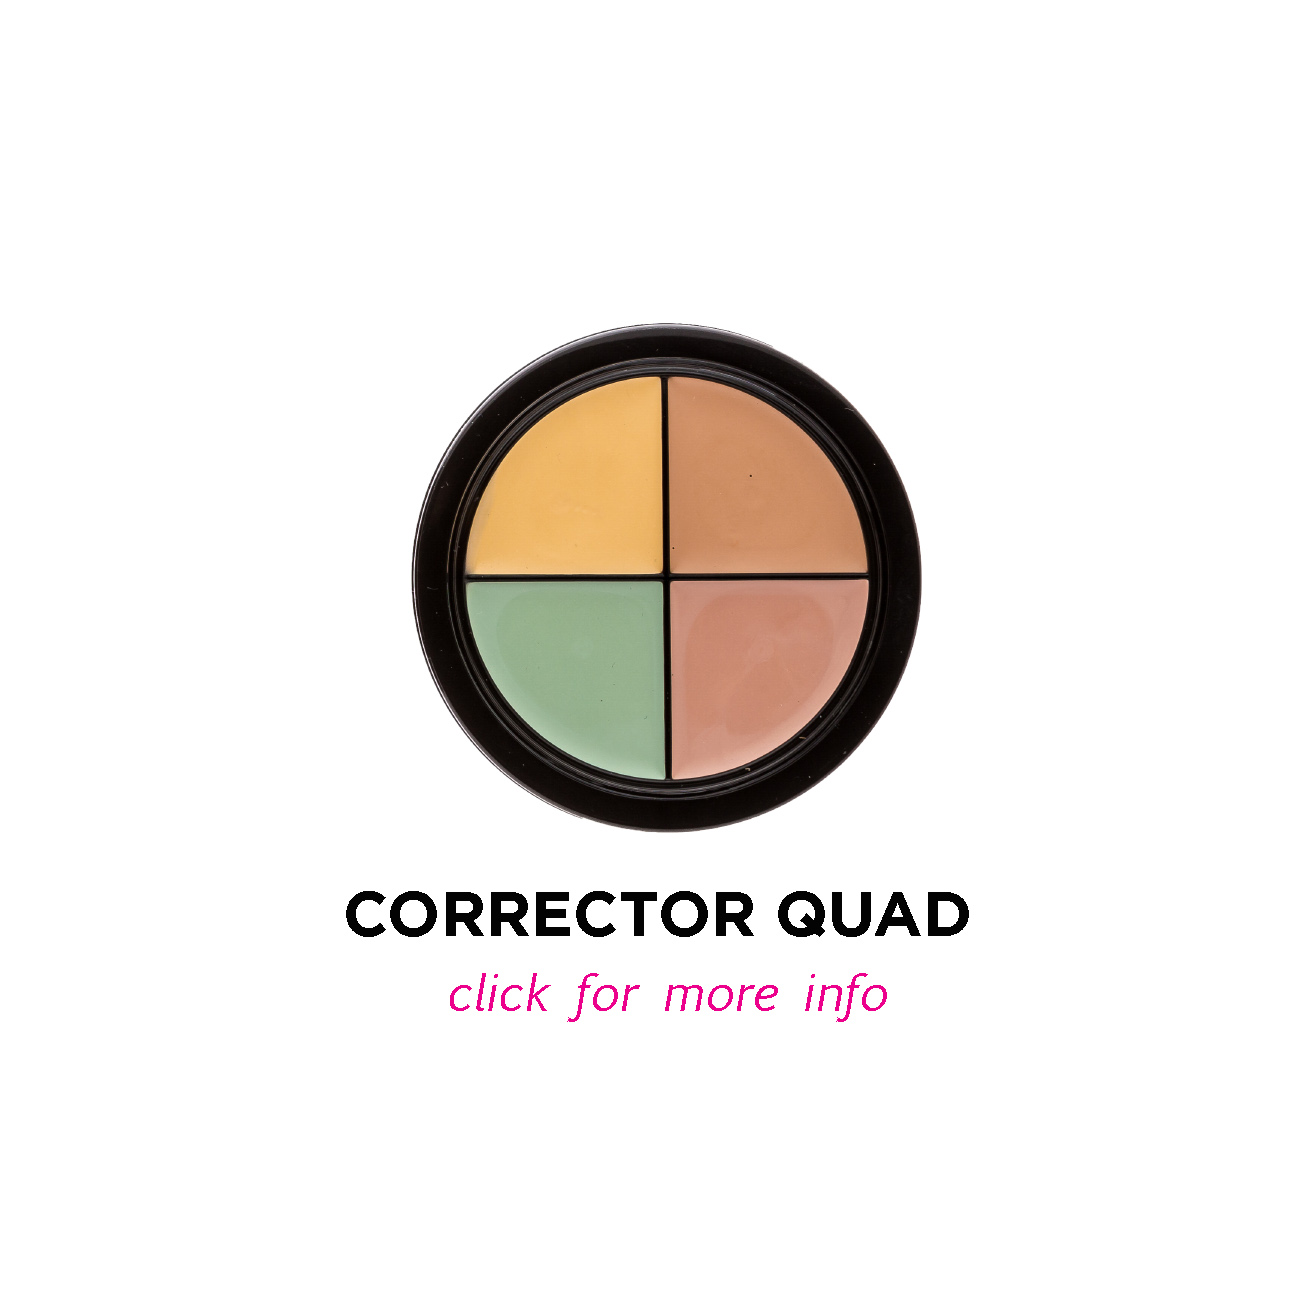 Corrector Quad